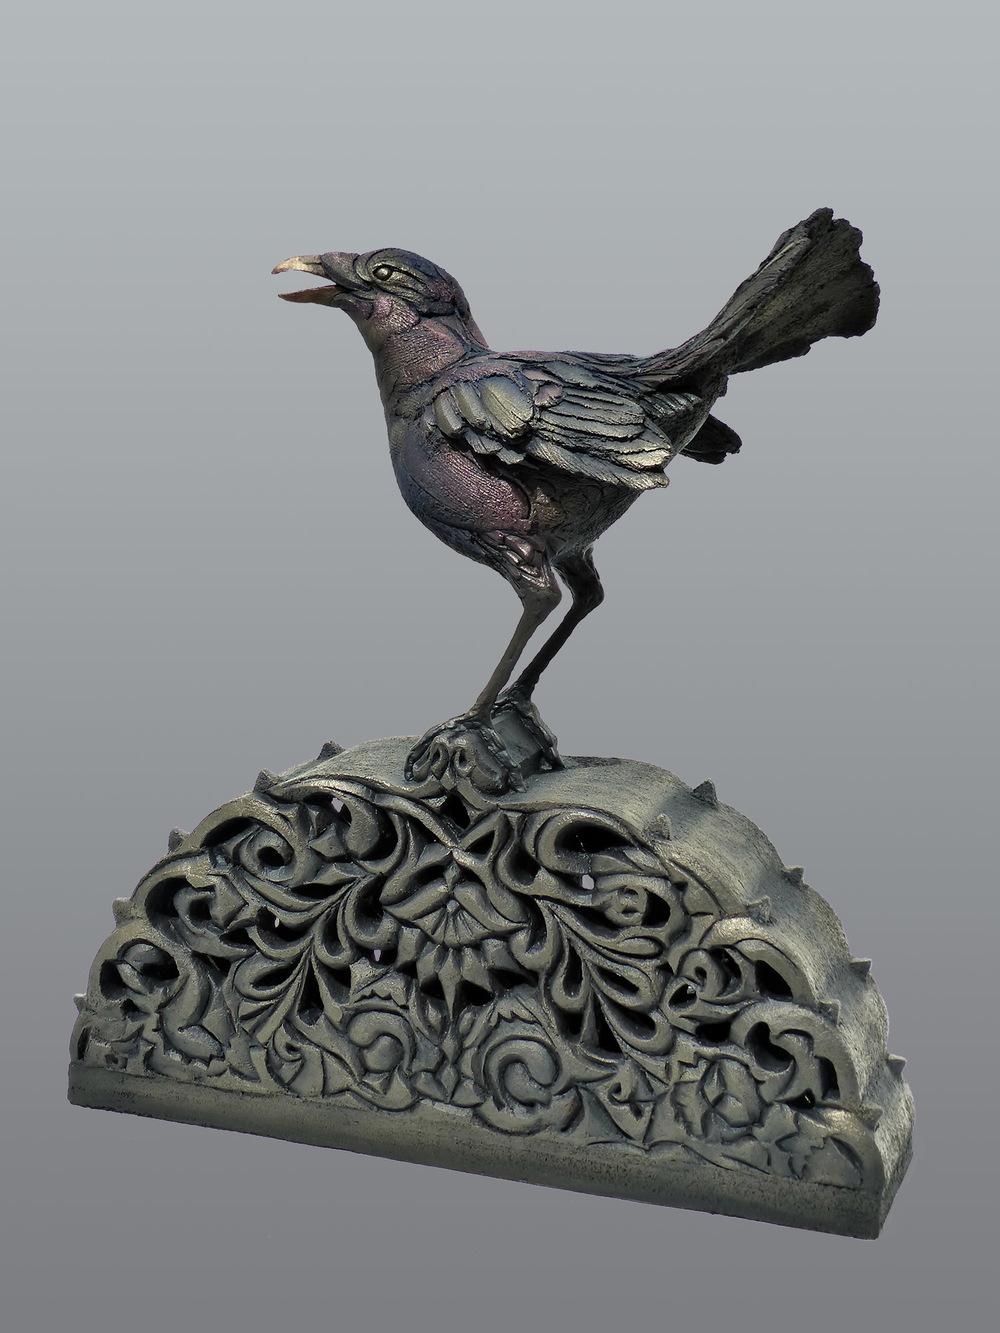 Satin Bower Bird  ©  50 cm high x 46 cm wide  Unique